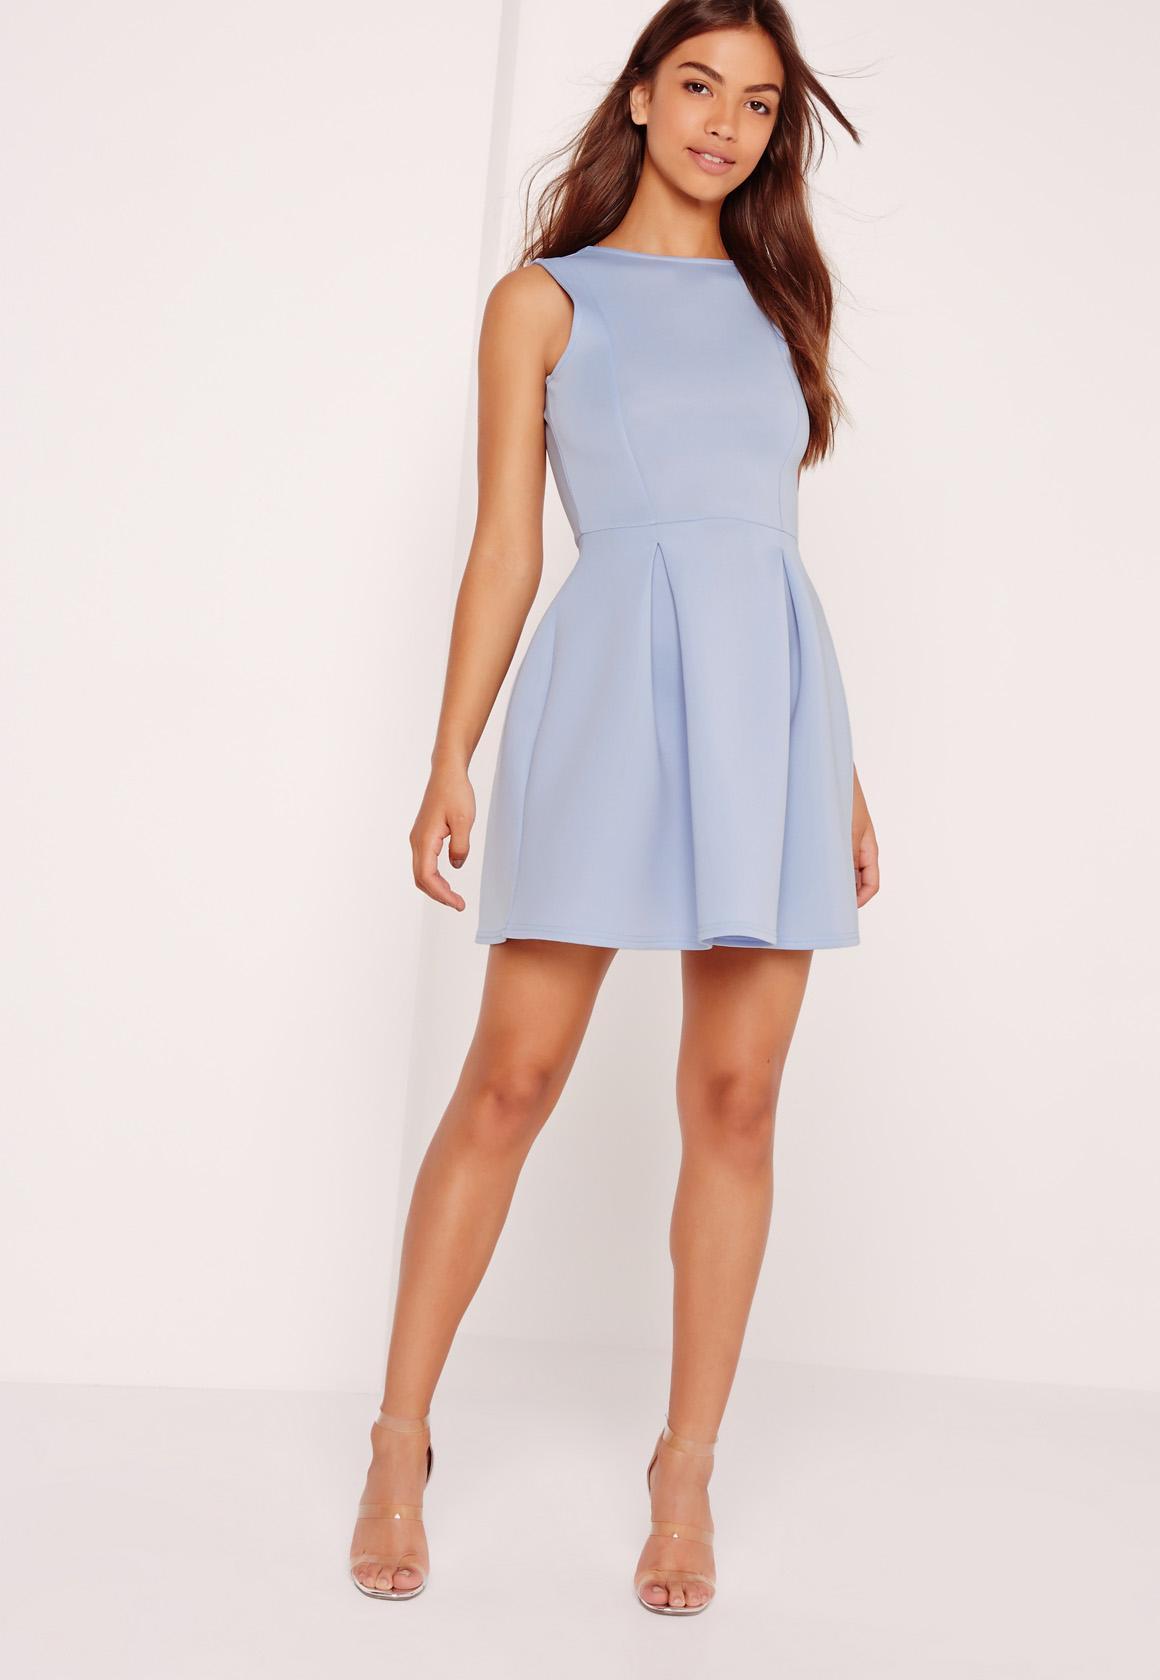 backless dresses